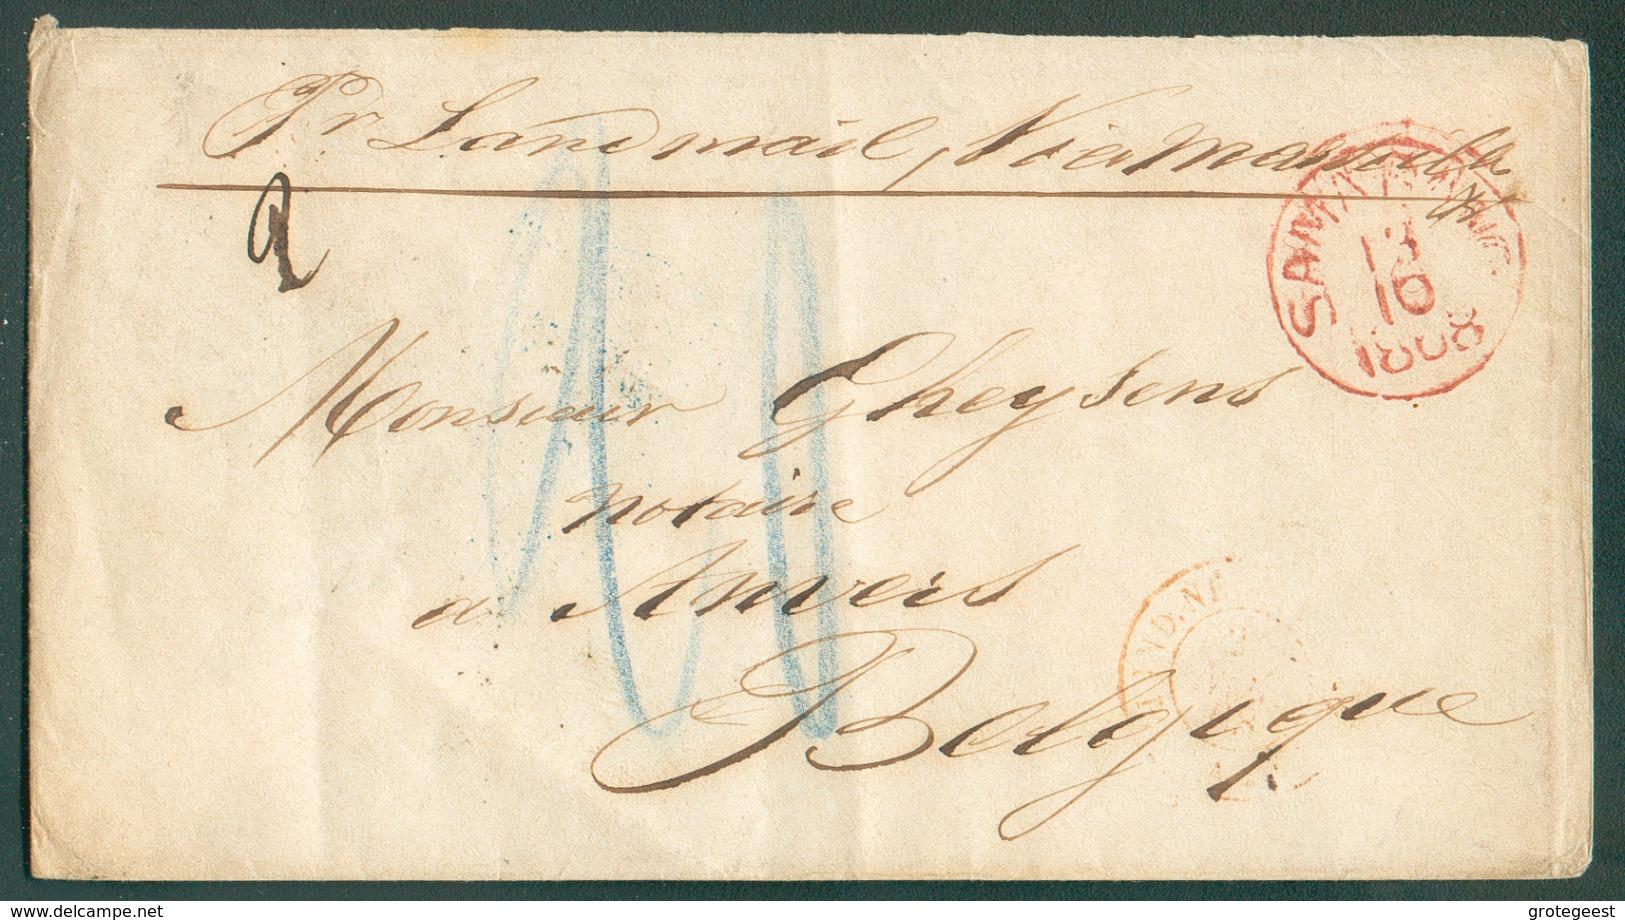 Enveloppe De SAMARANG 13/10 1868 Vers Anvers (Belgique) Manuscrit 'Pr Landmail Via Marseille', Verso : Griffe Rouge JAPA - Netherlands Indies